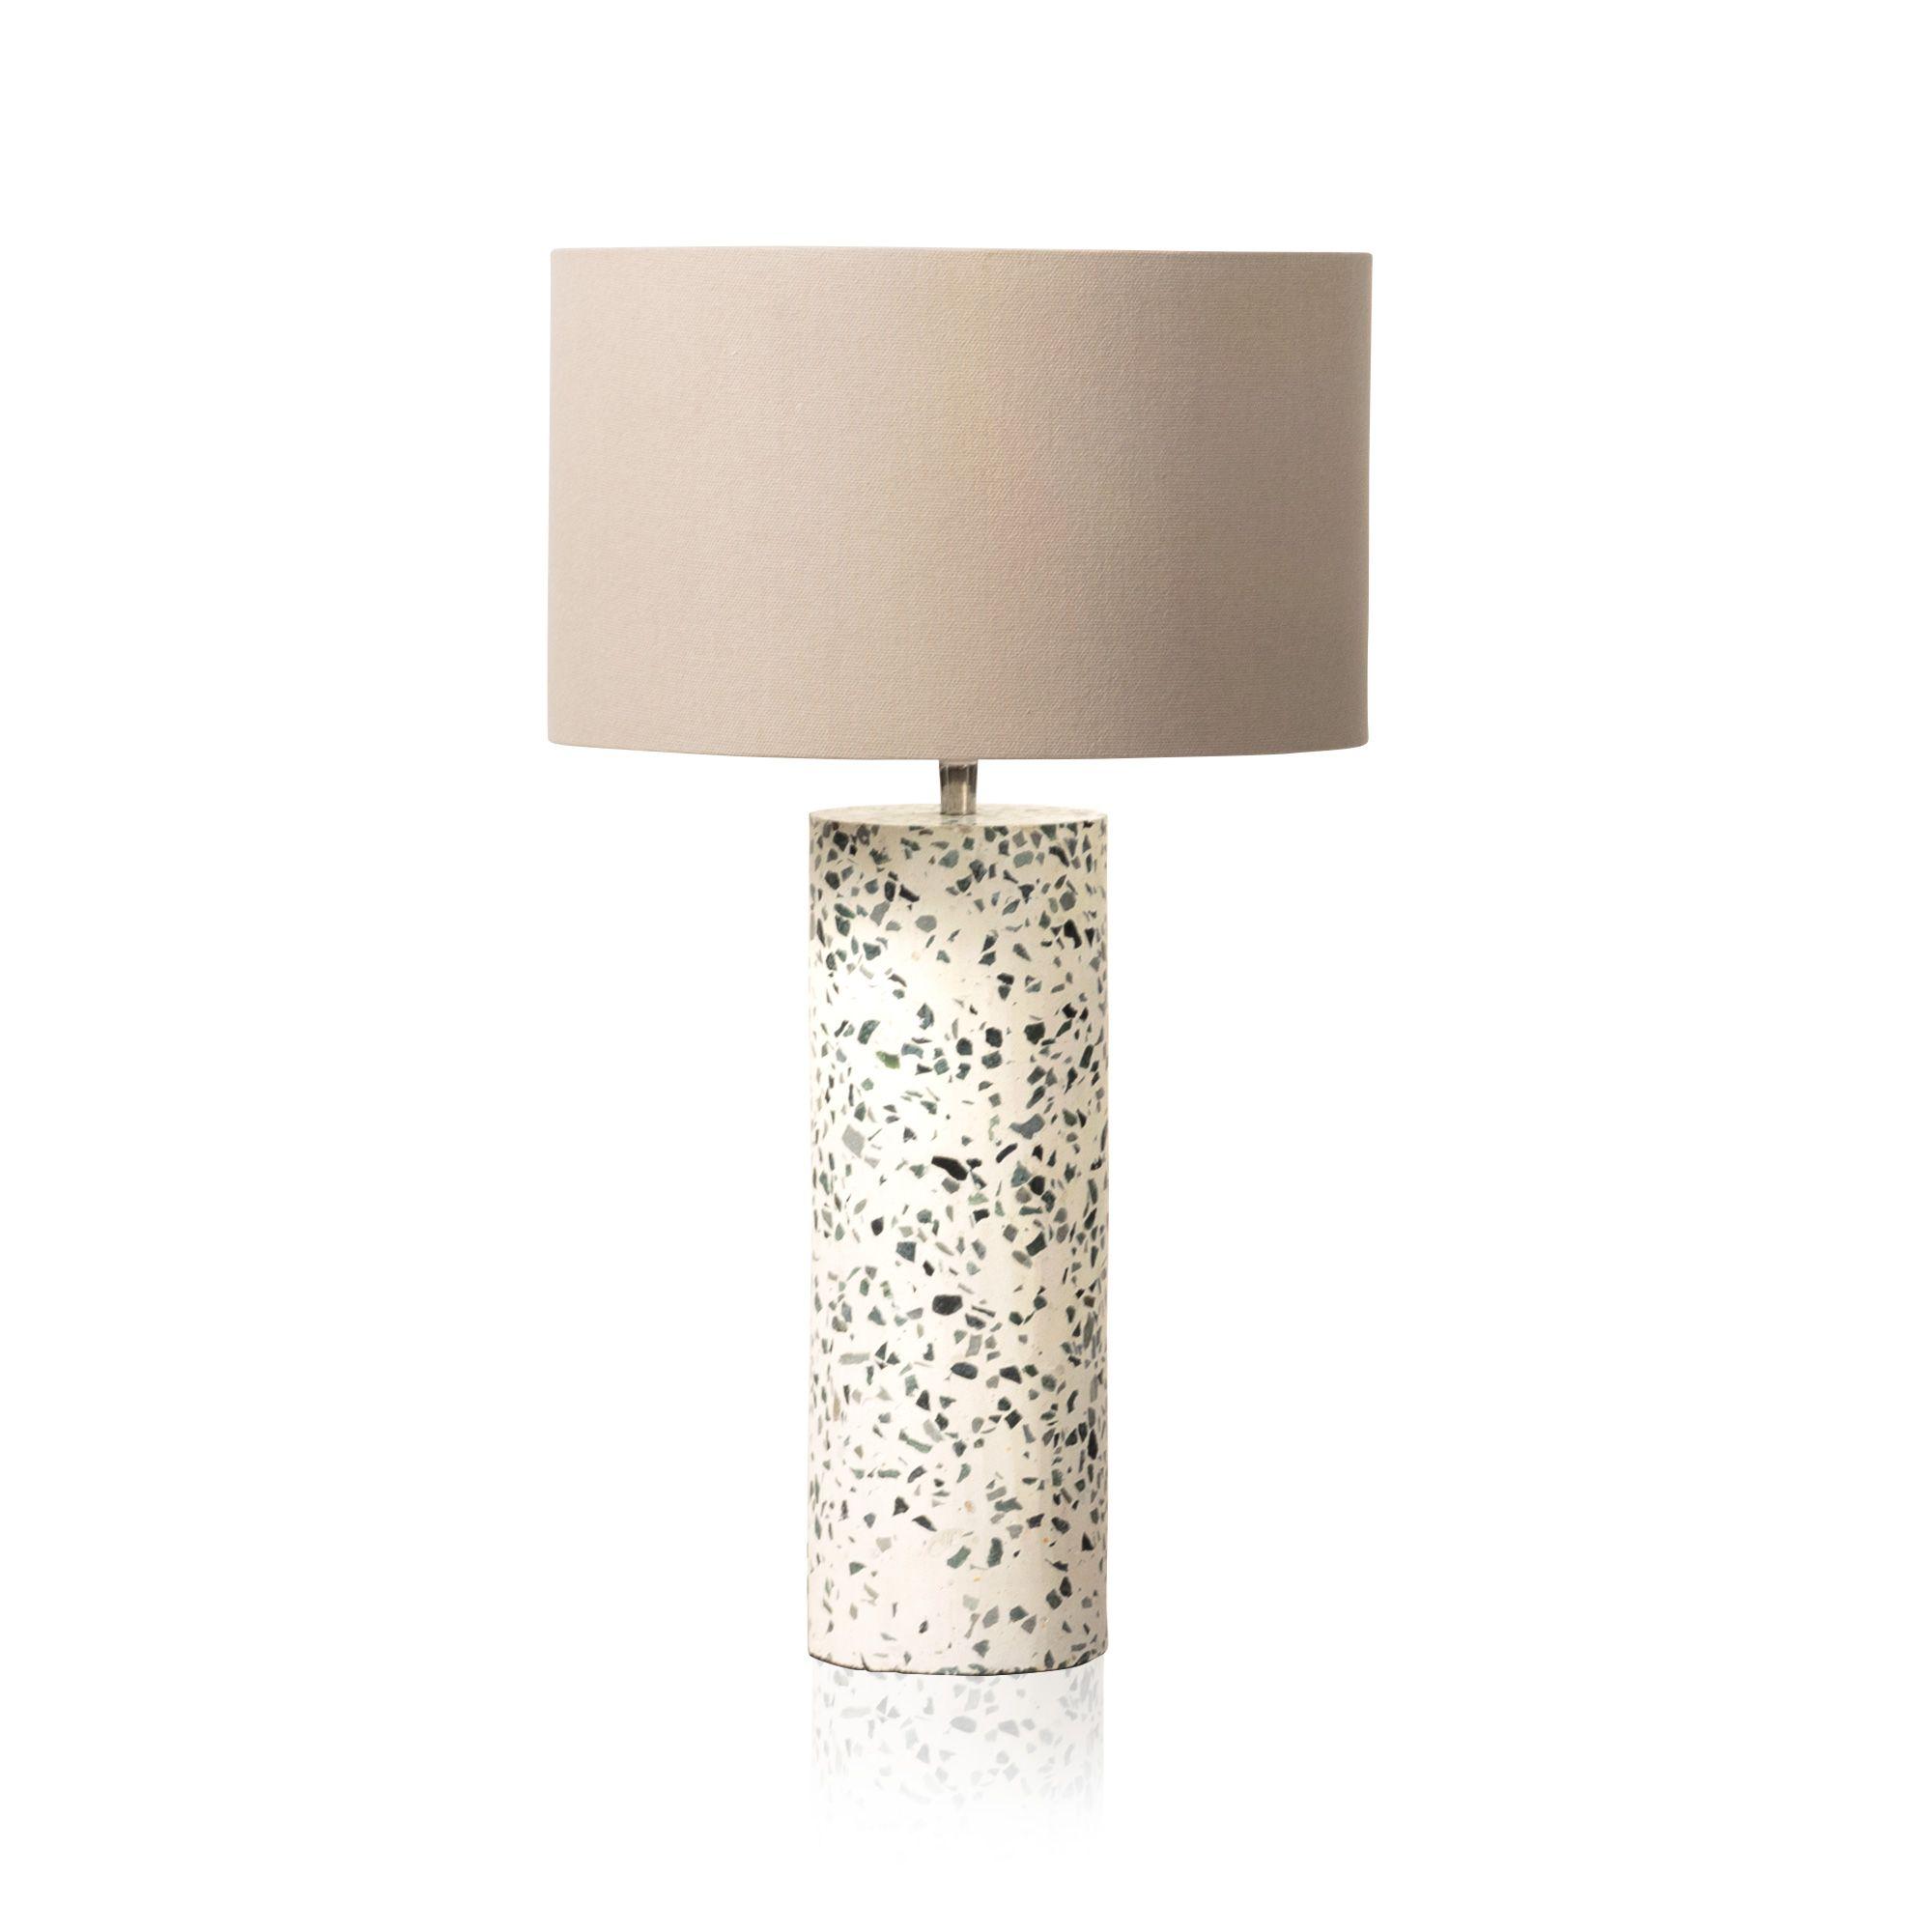 Terrazzo Table Lamp Terrazzo Element Lighting